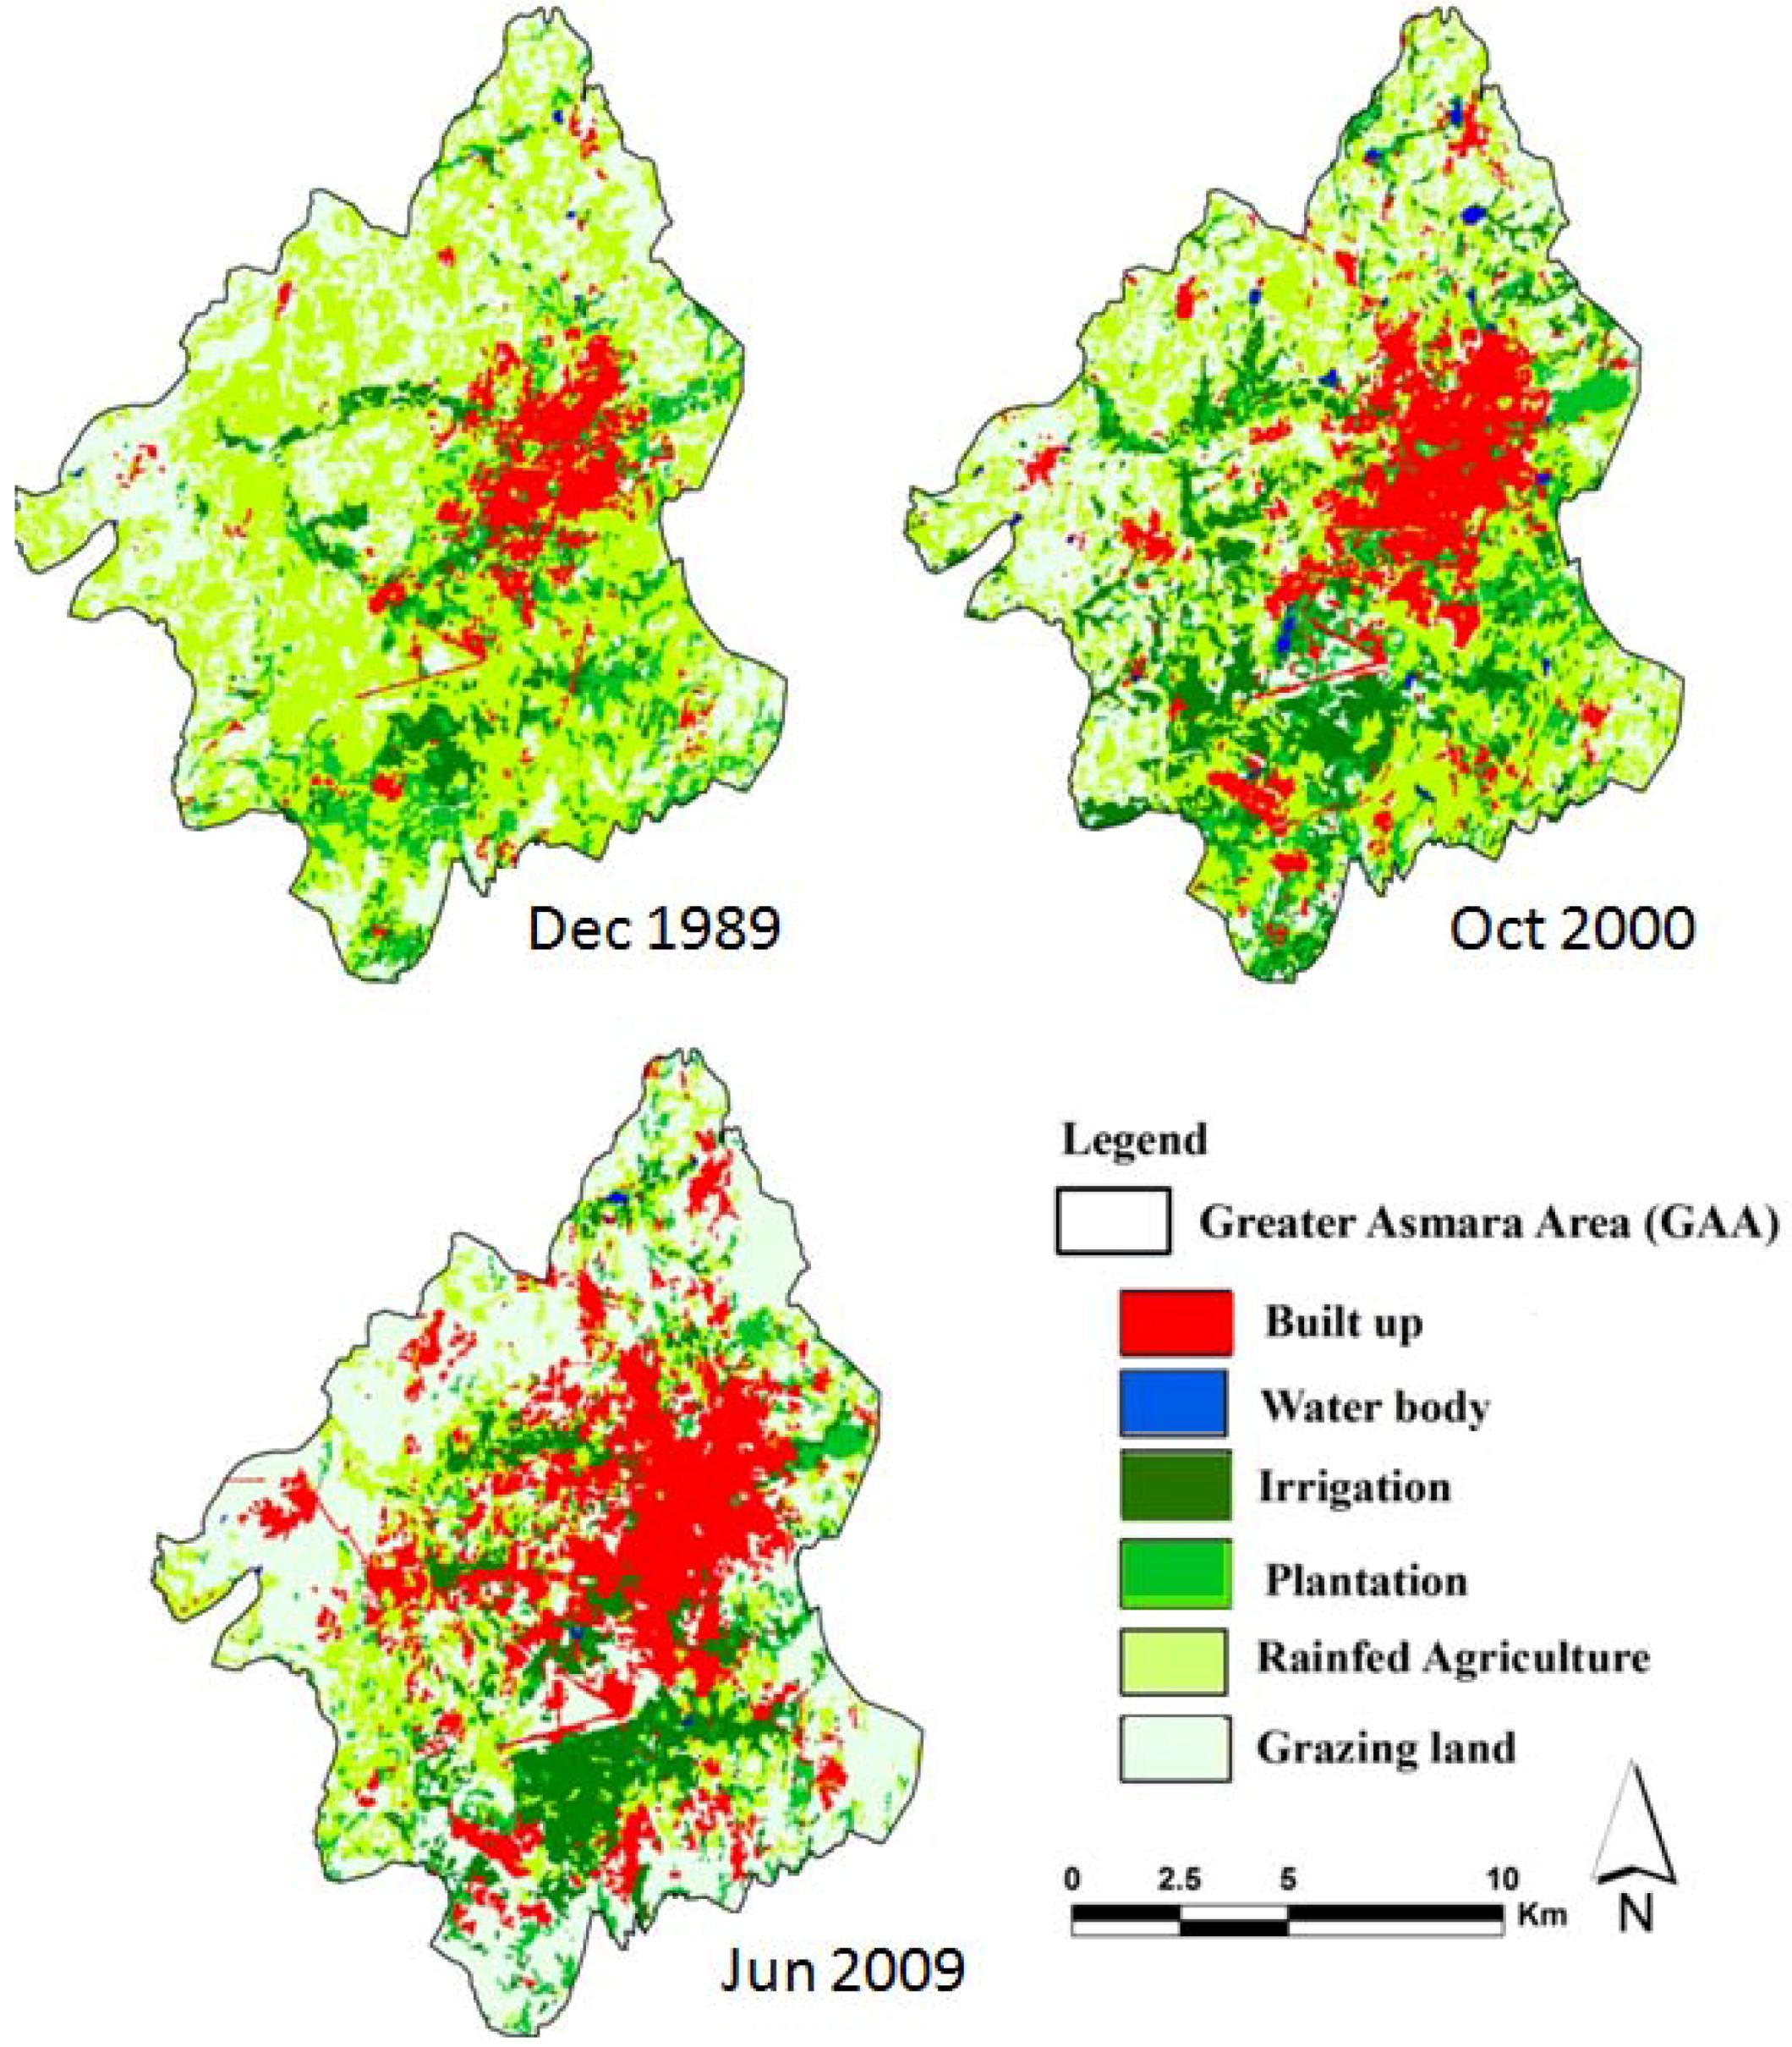 an analysis of urban sprawl Work package 5 – task 55 analysis of the development of the housing market in sofia 1 market analysis of urban sprawl in sofia assoc prof arch alexander slaev.